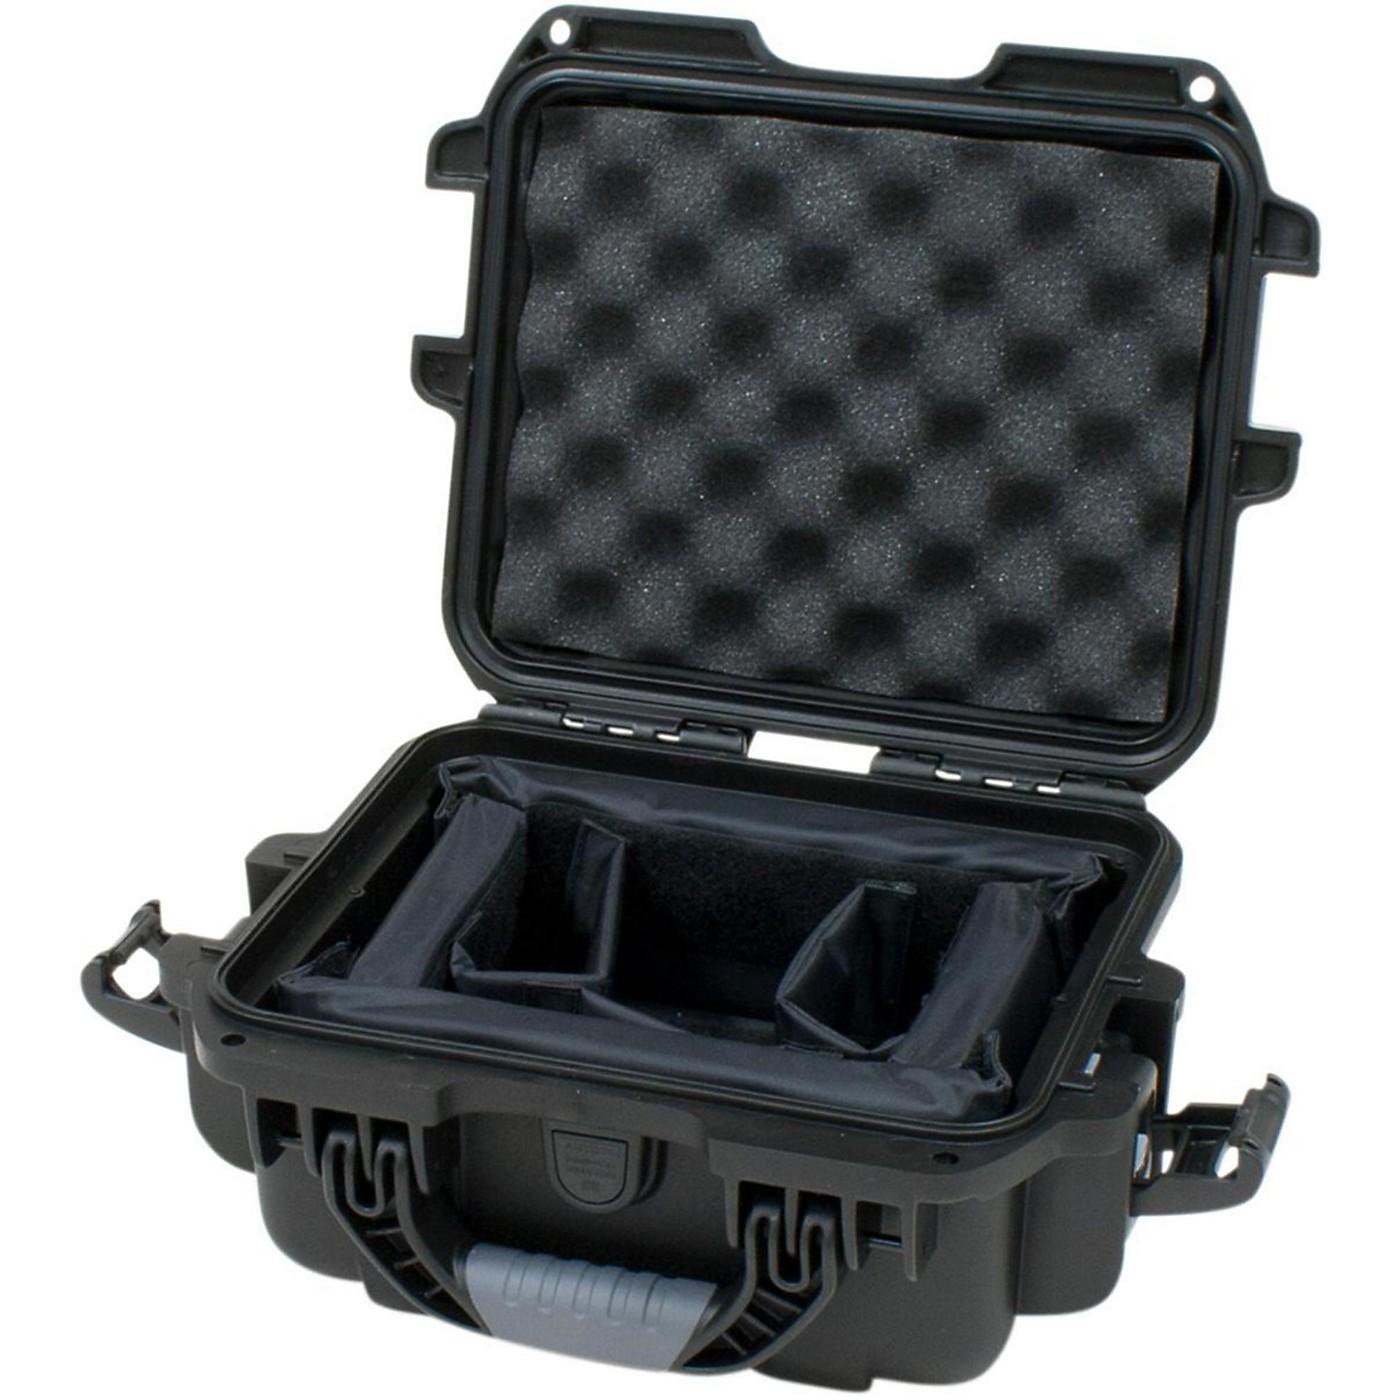 Gator GU-0907-05-WPDV Waterproof Injection Molded Case thumbnail